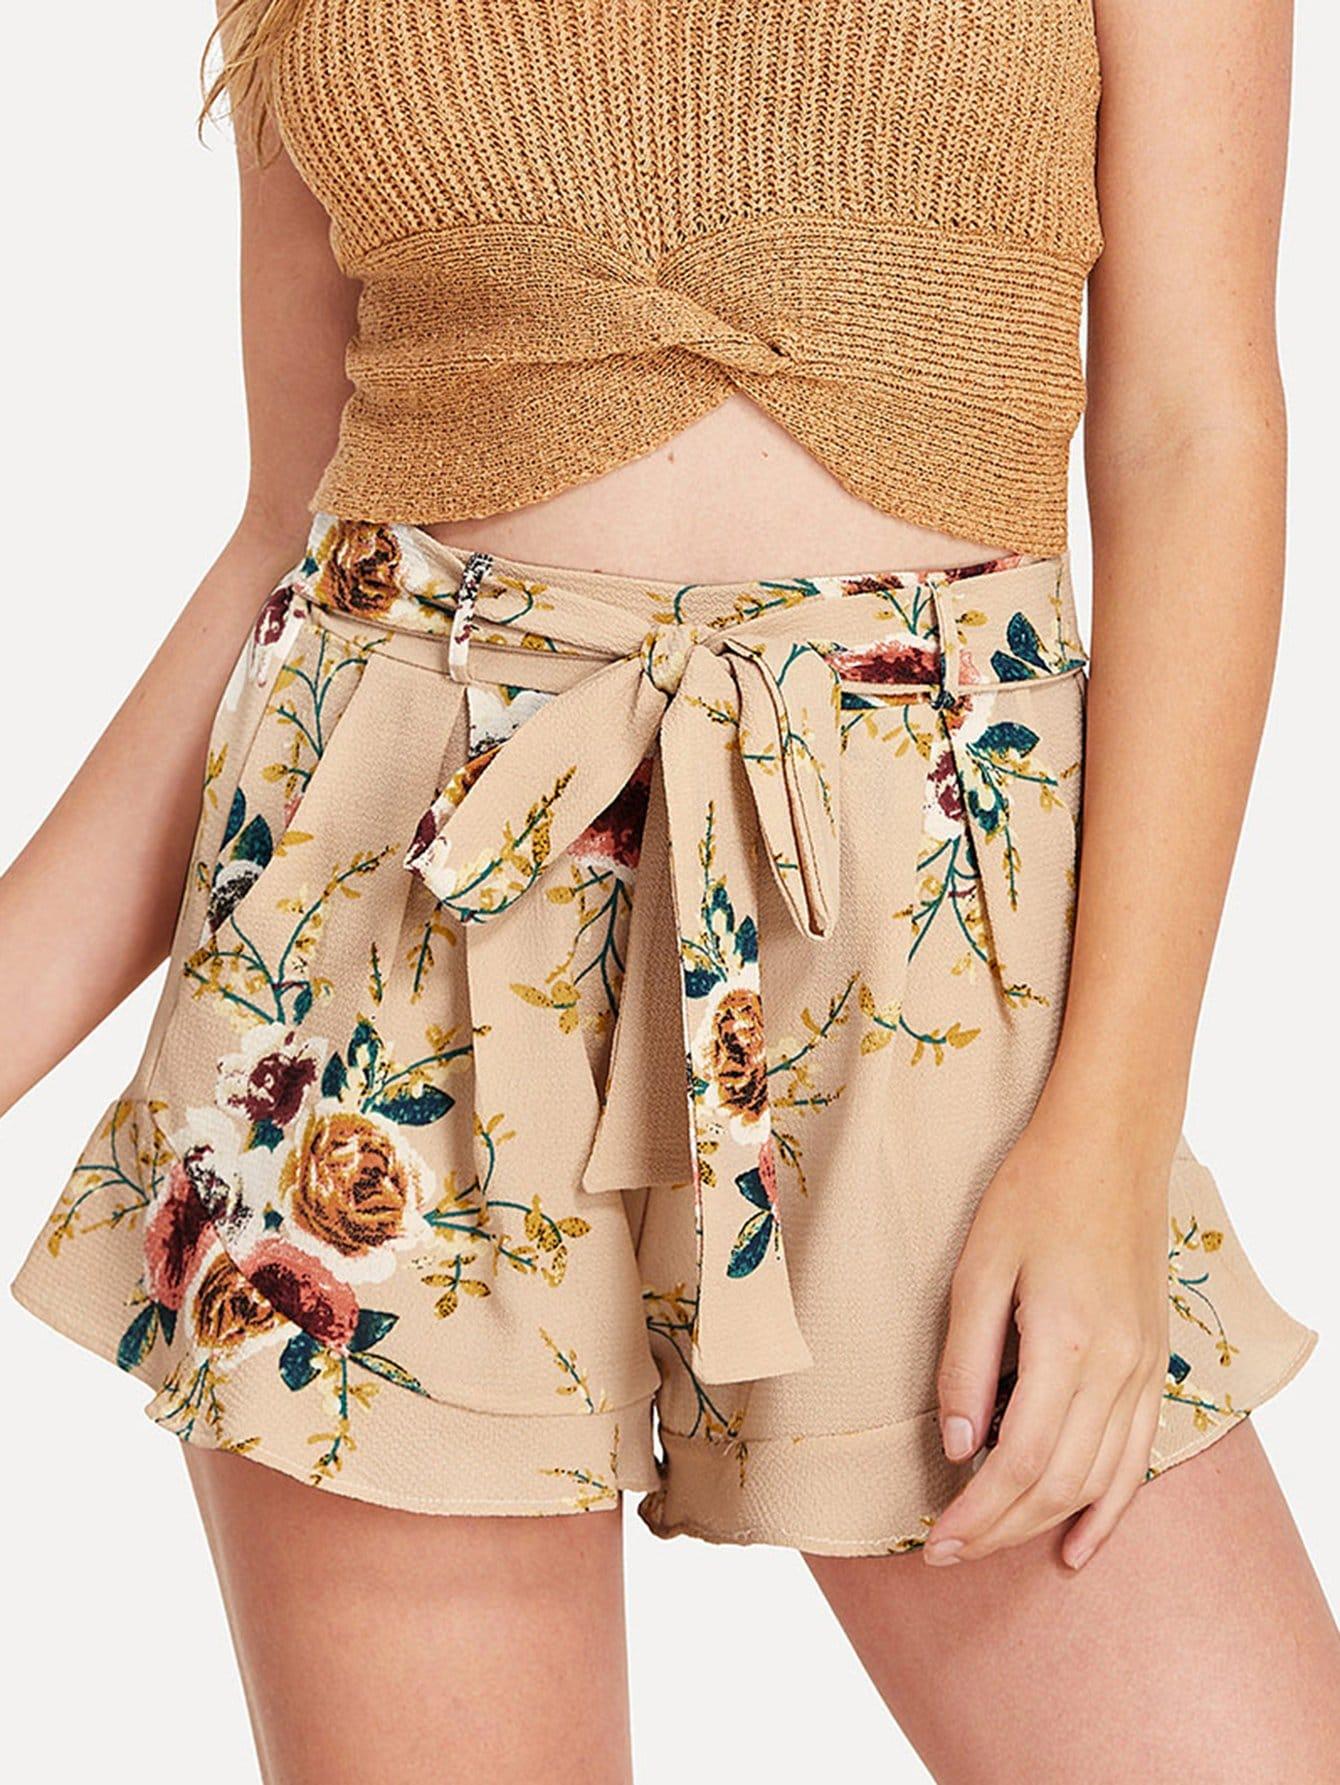 Floral Print Self Tie Waist Shorts self tie floral